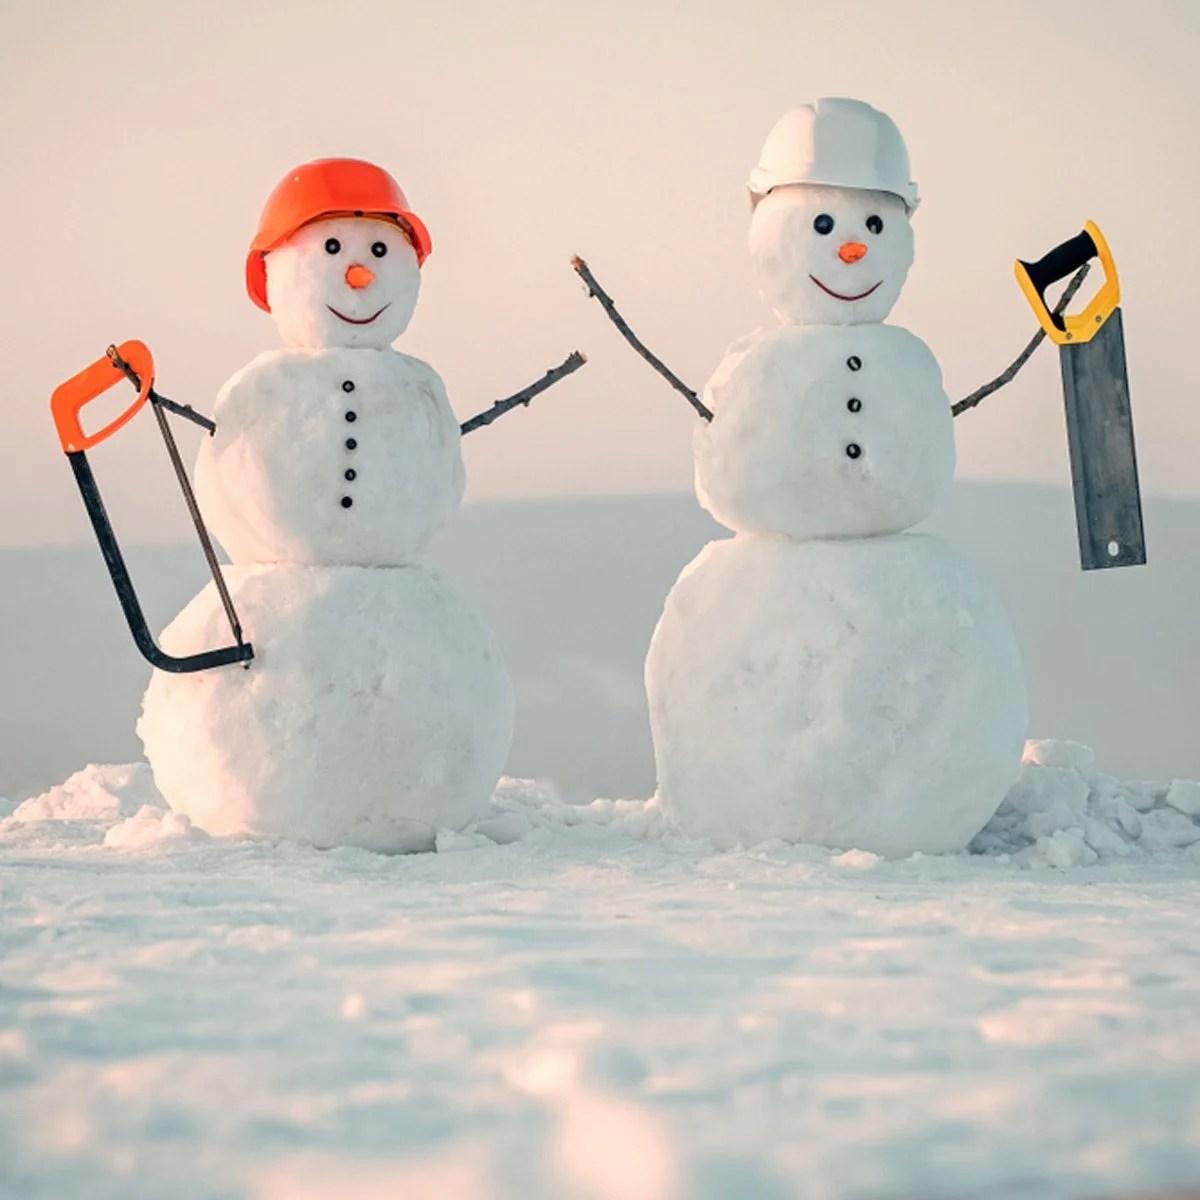 9 Diy Snowman Making Ideas Everyone Will Love